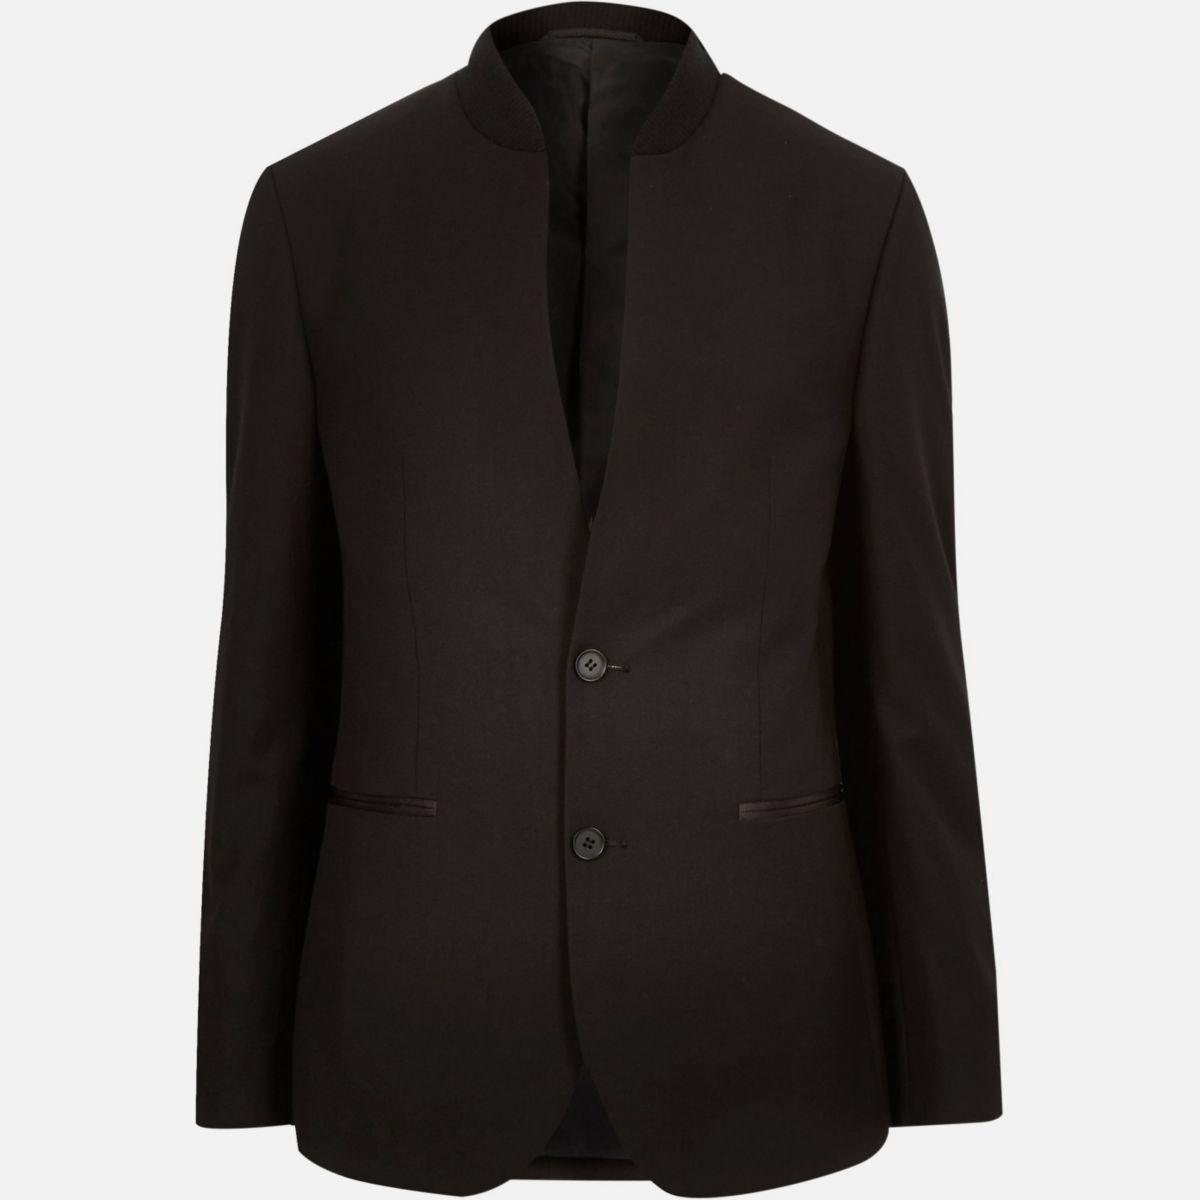 Blazer cintré noir habillé à col retourné